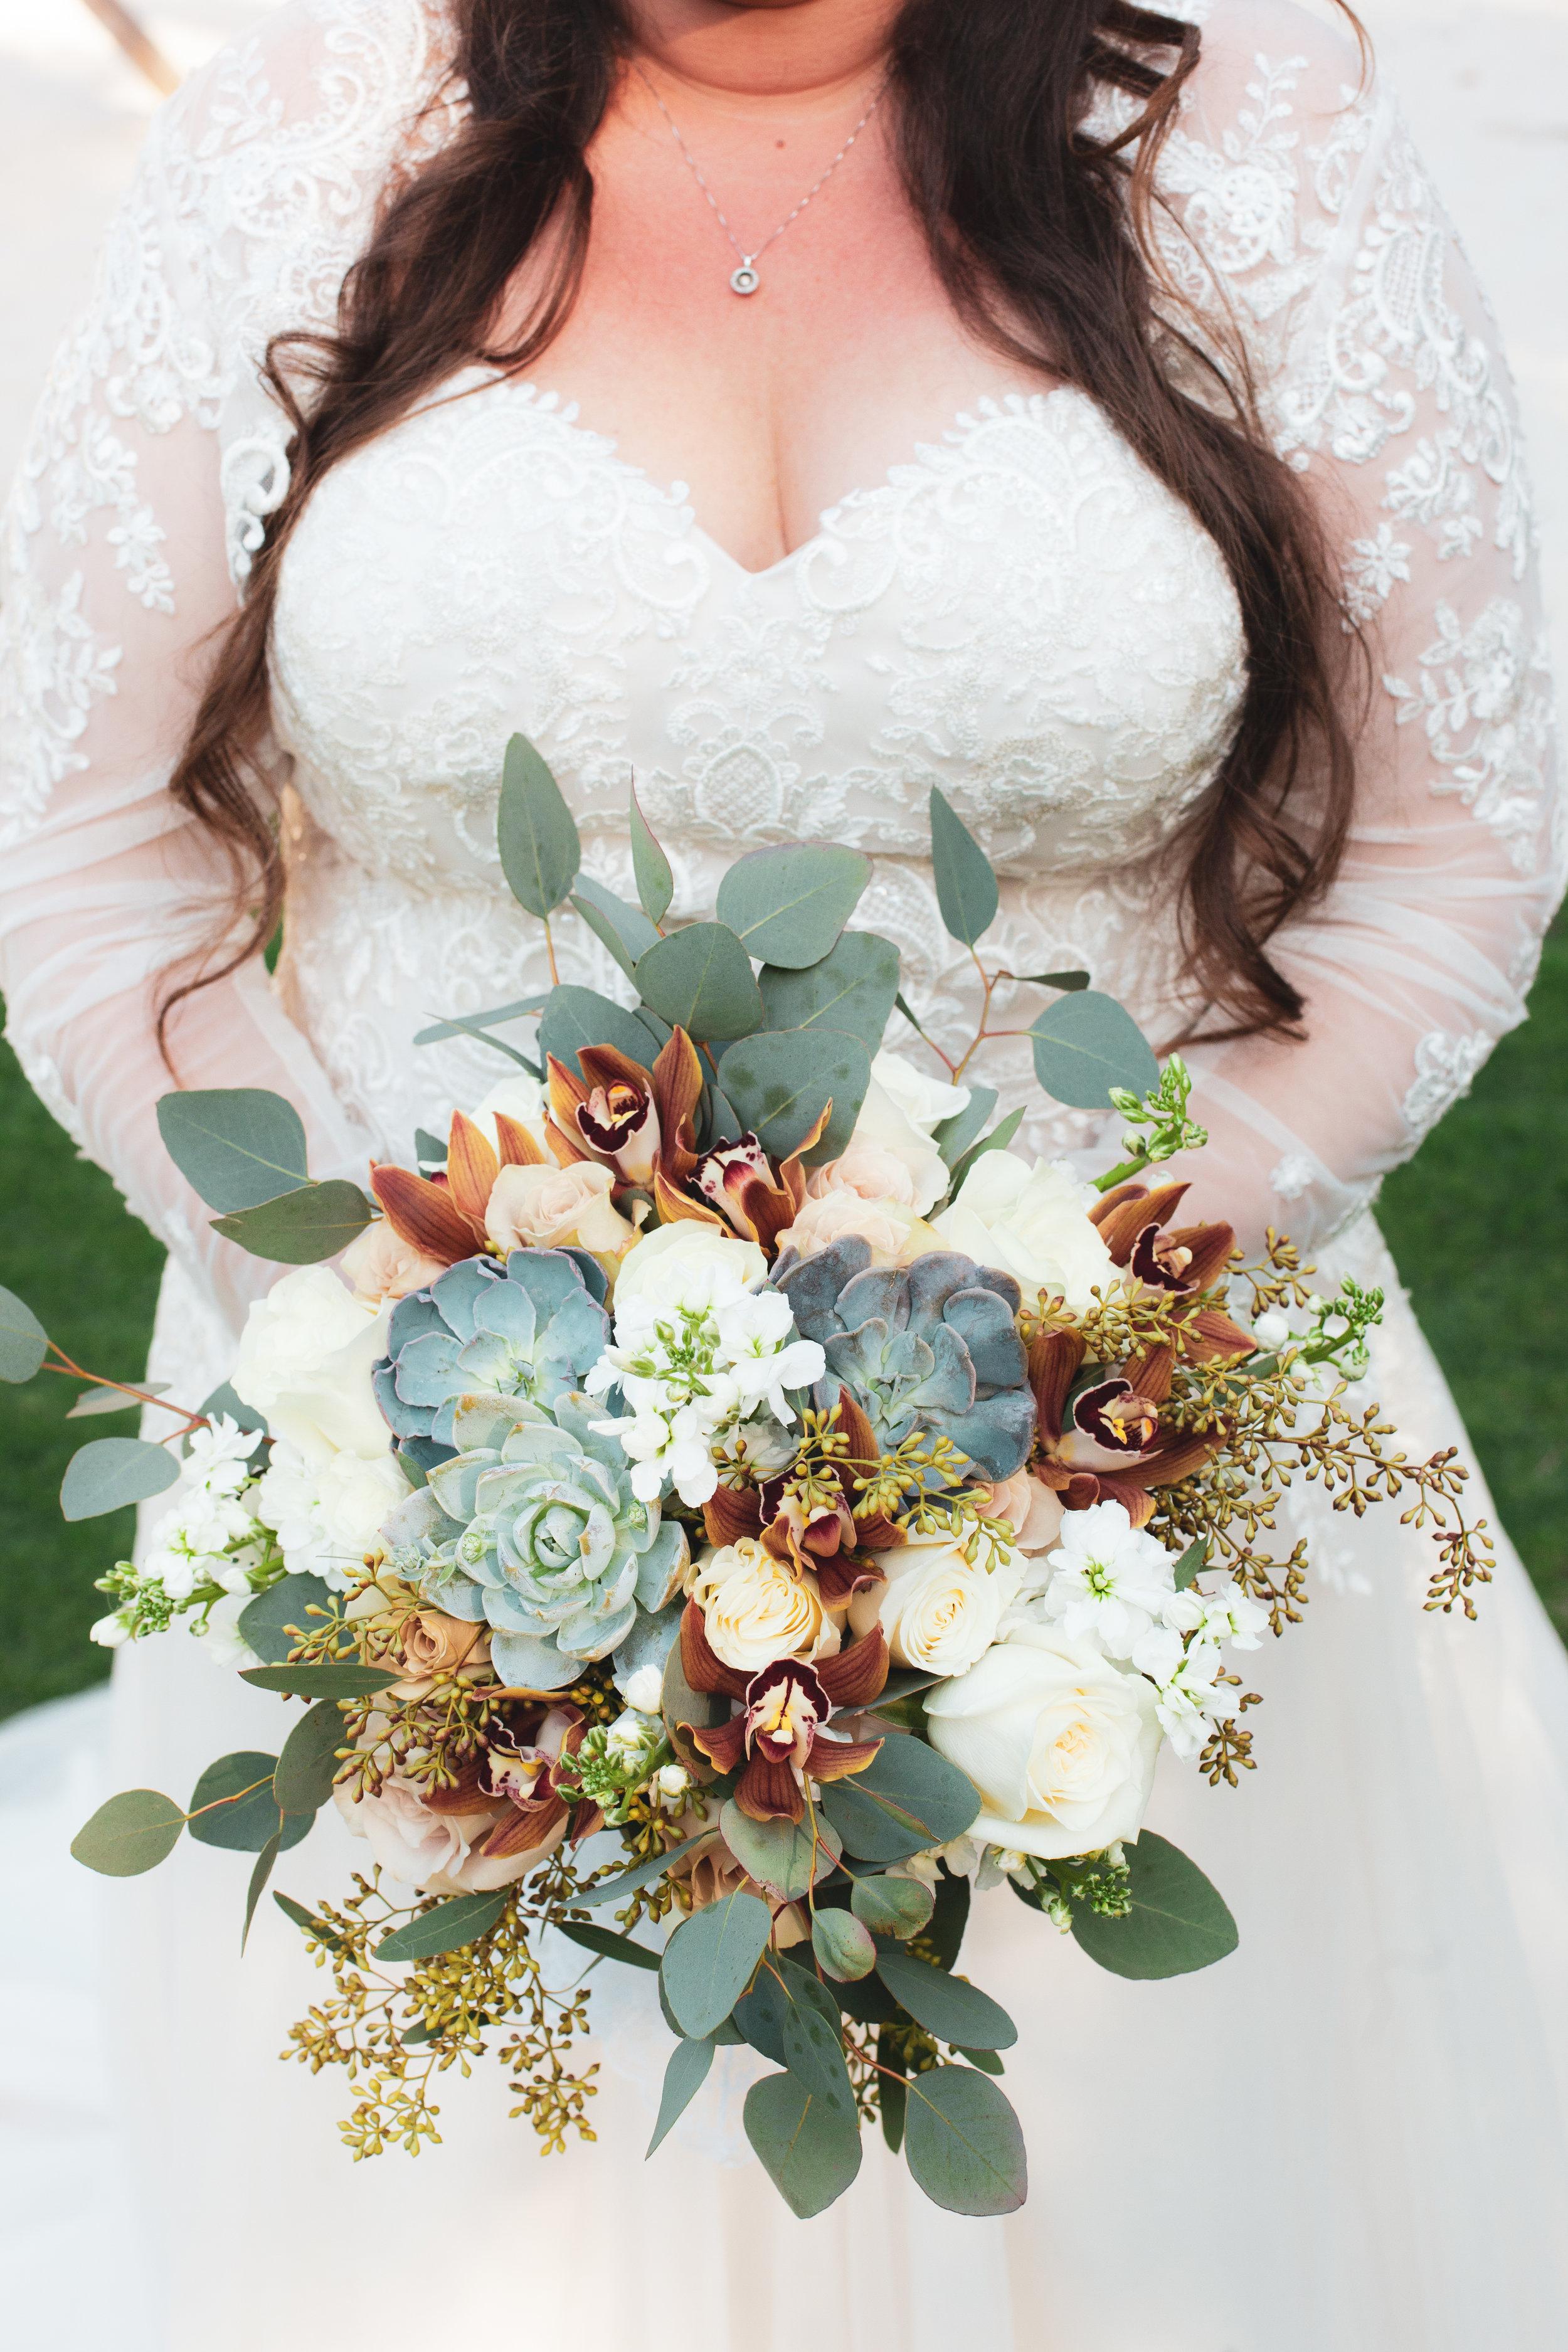 key largo florida beach wedding © kelilina photography 20190316163414-1.jpg